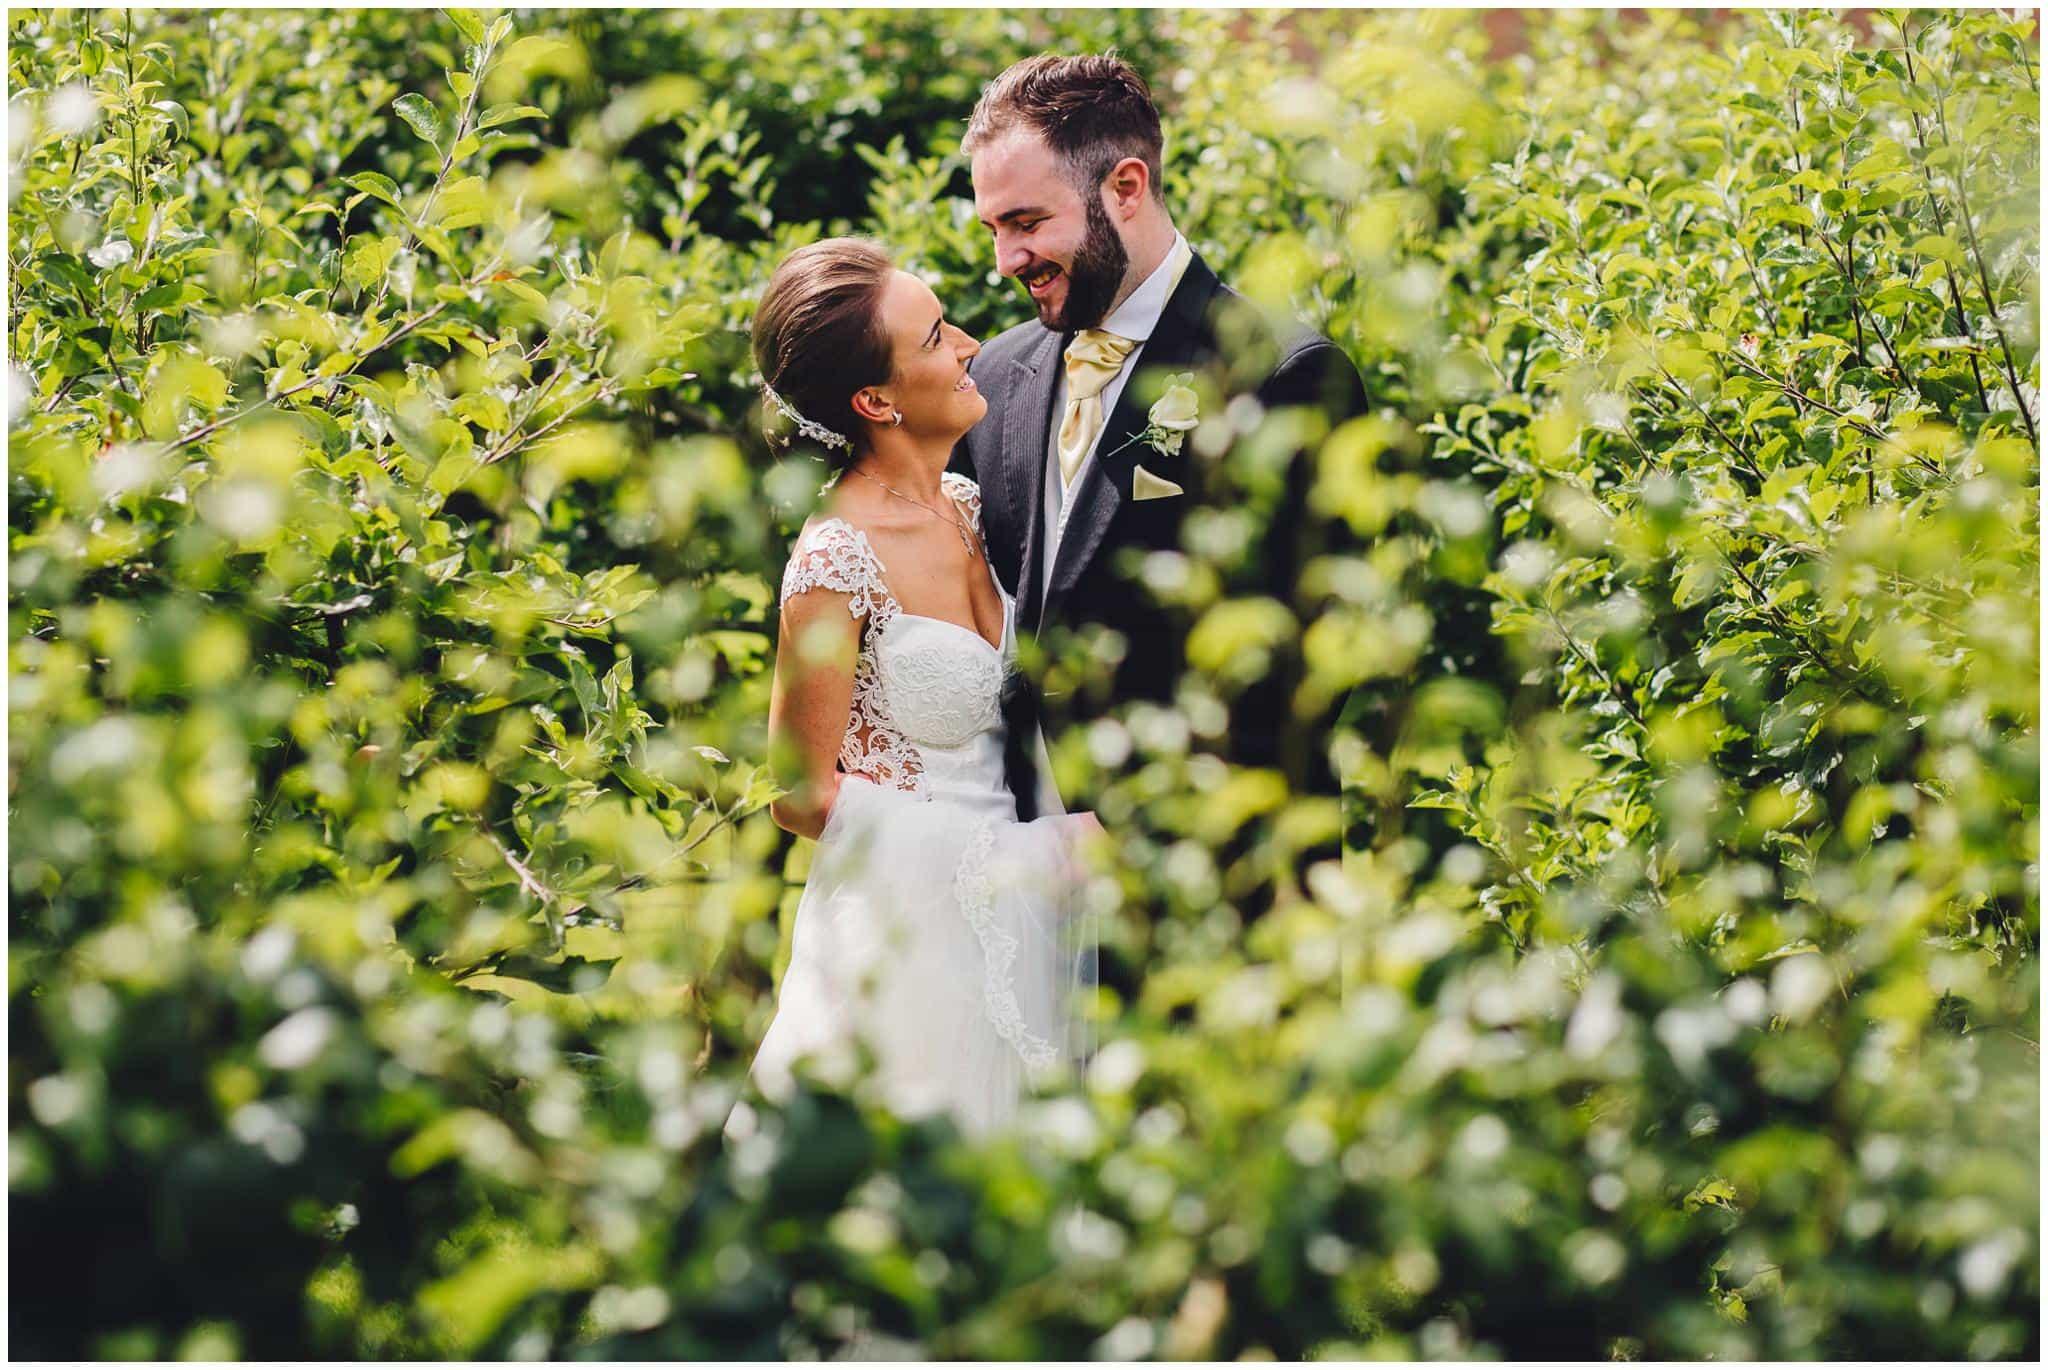 combermere-abbey-wedding-photographer-59